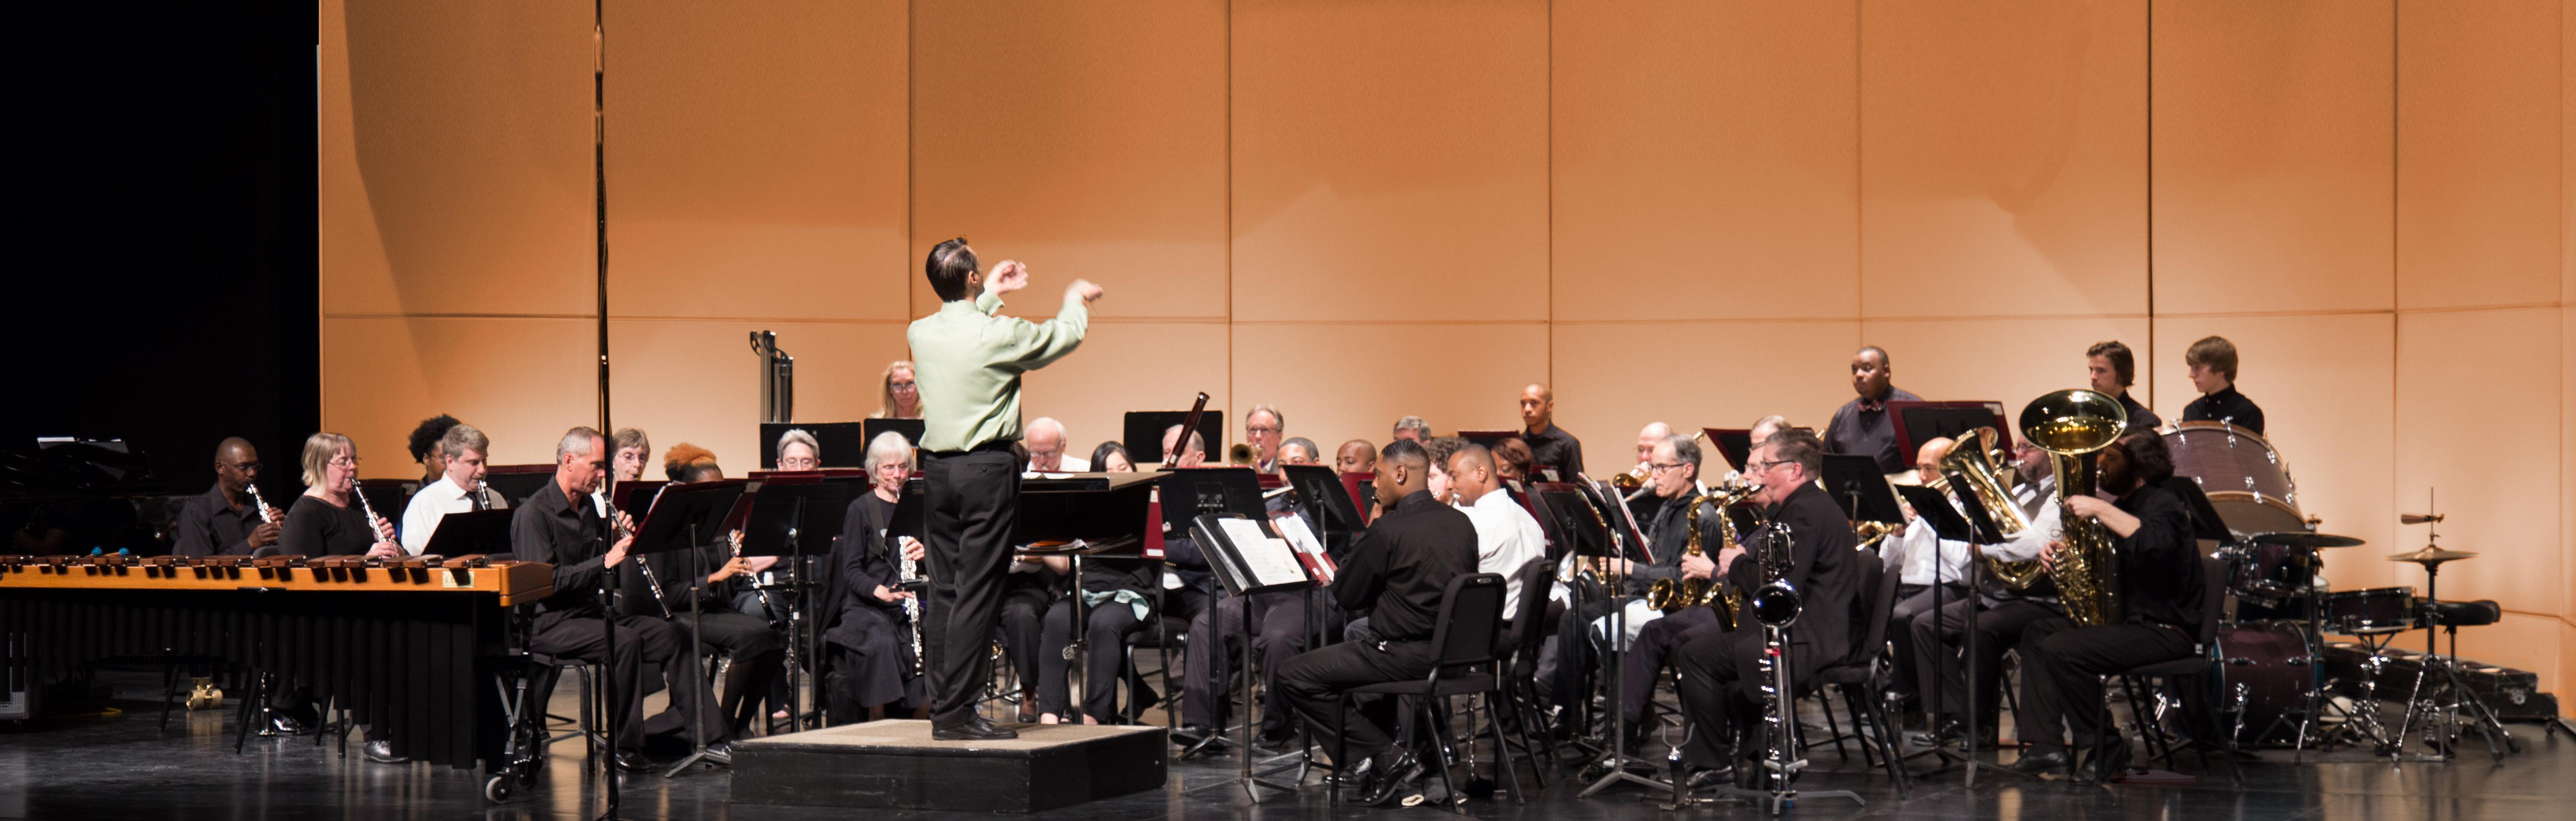 Perimeter College Community Wind Ensemble | Concert Band